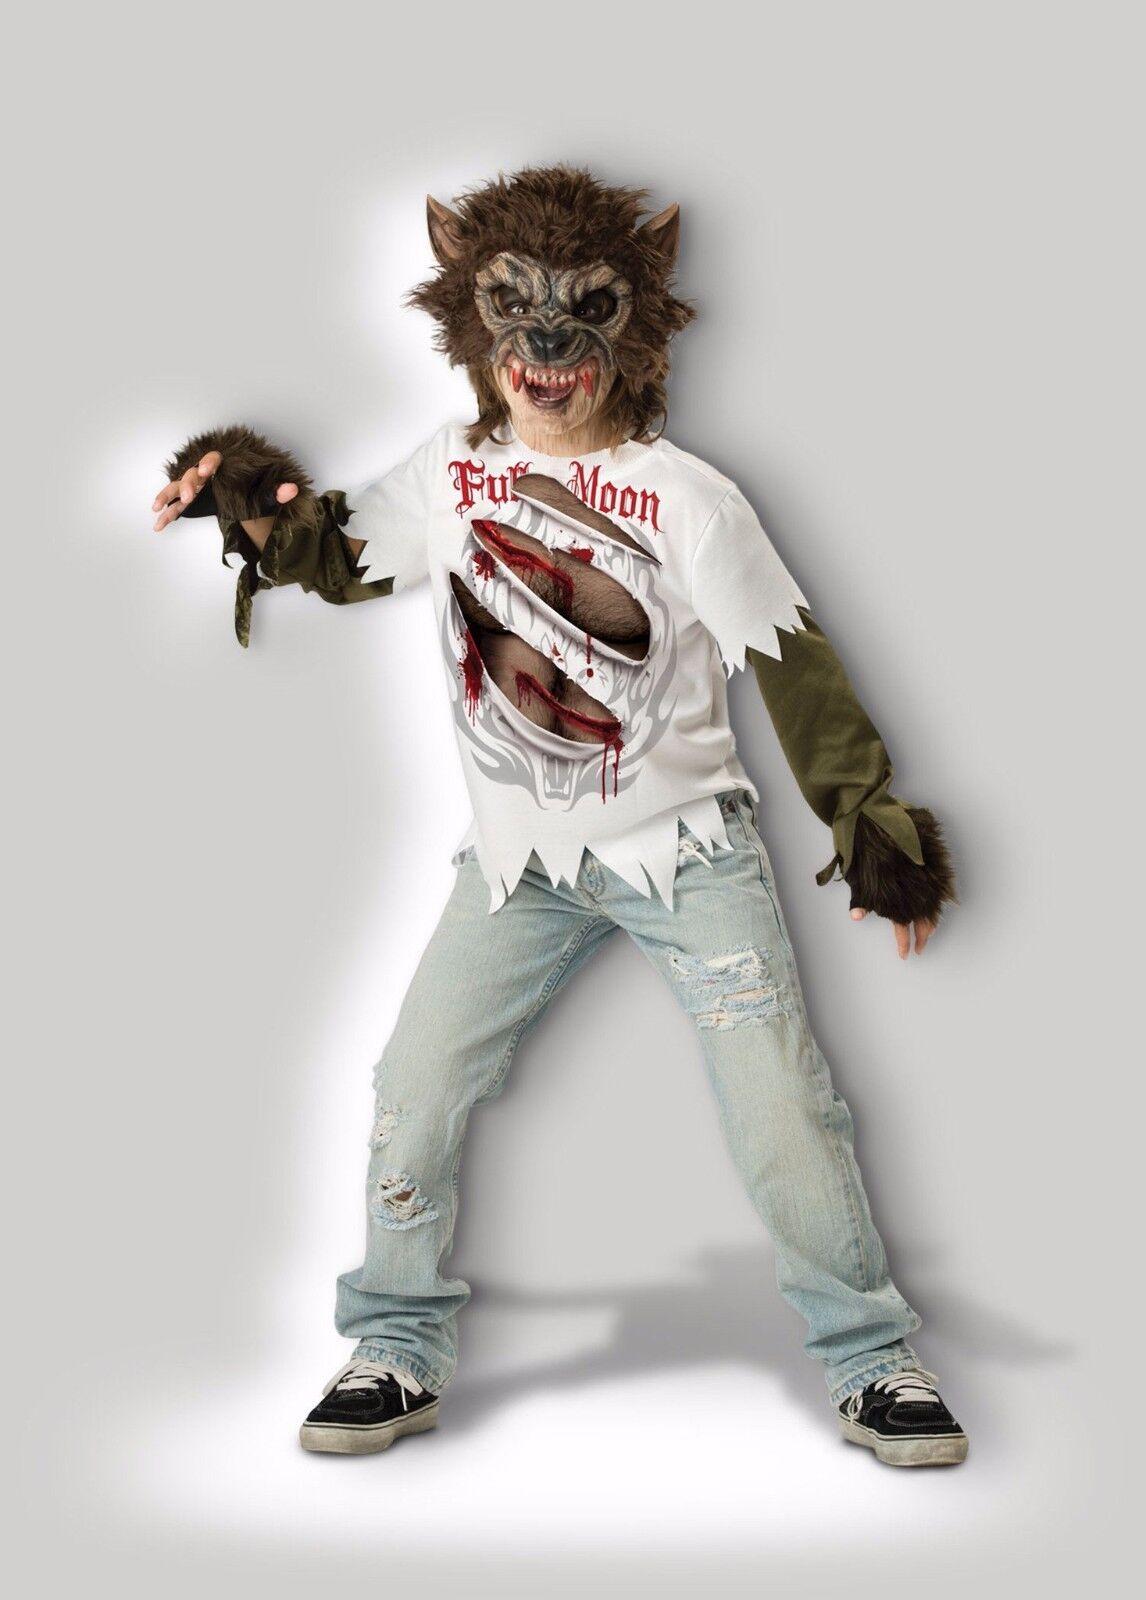 Incharacter Werewolf Moon Monster Creepy Child Boys Halloween Costume 17015